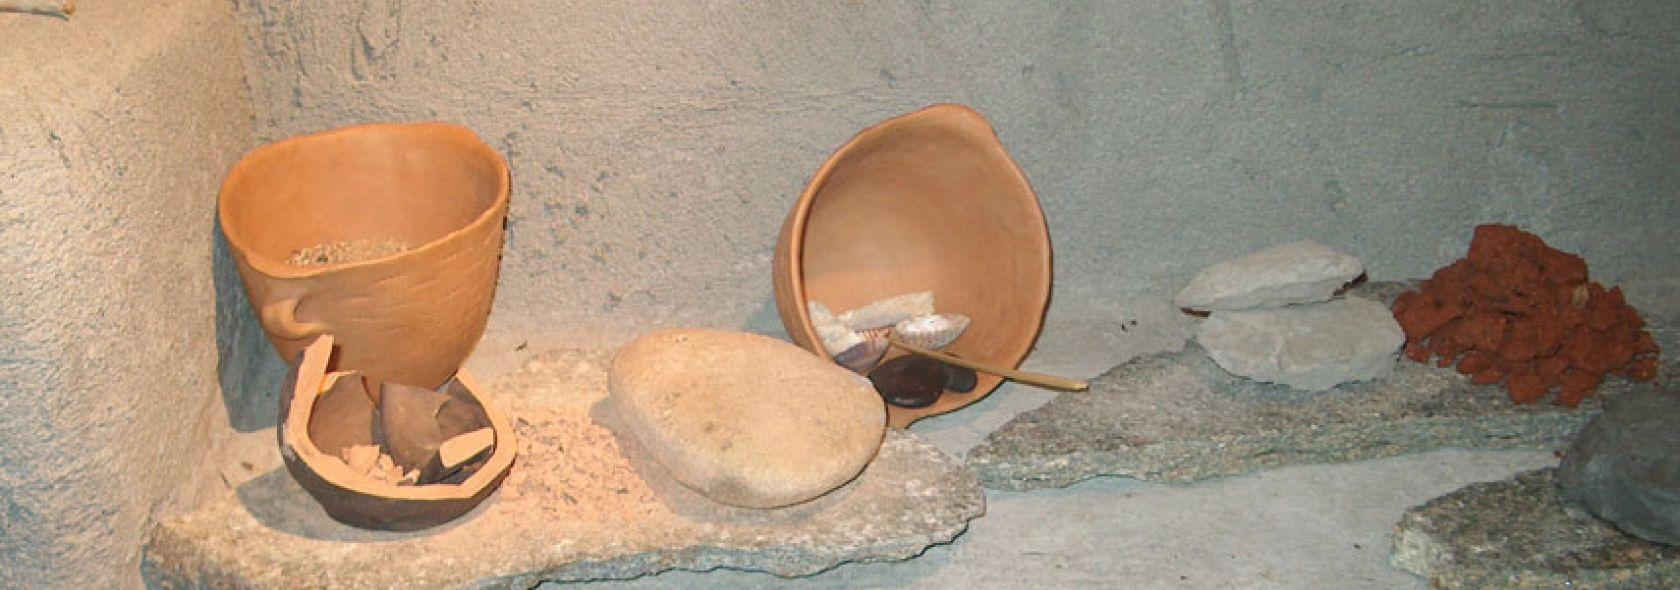 Museo di Archeologia Ligure - didattica